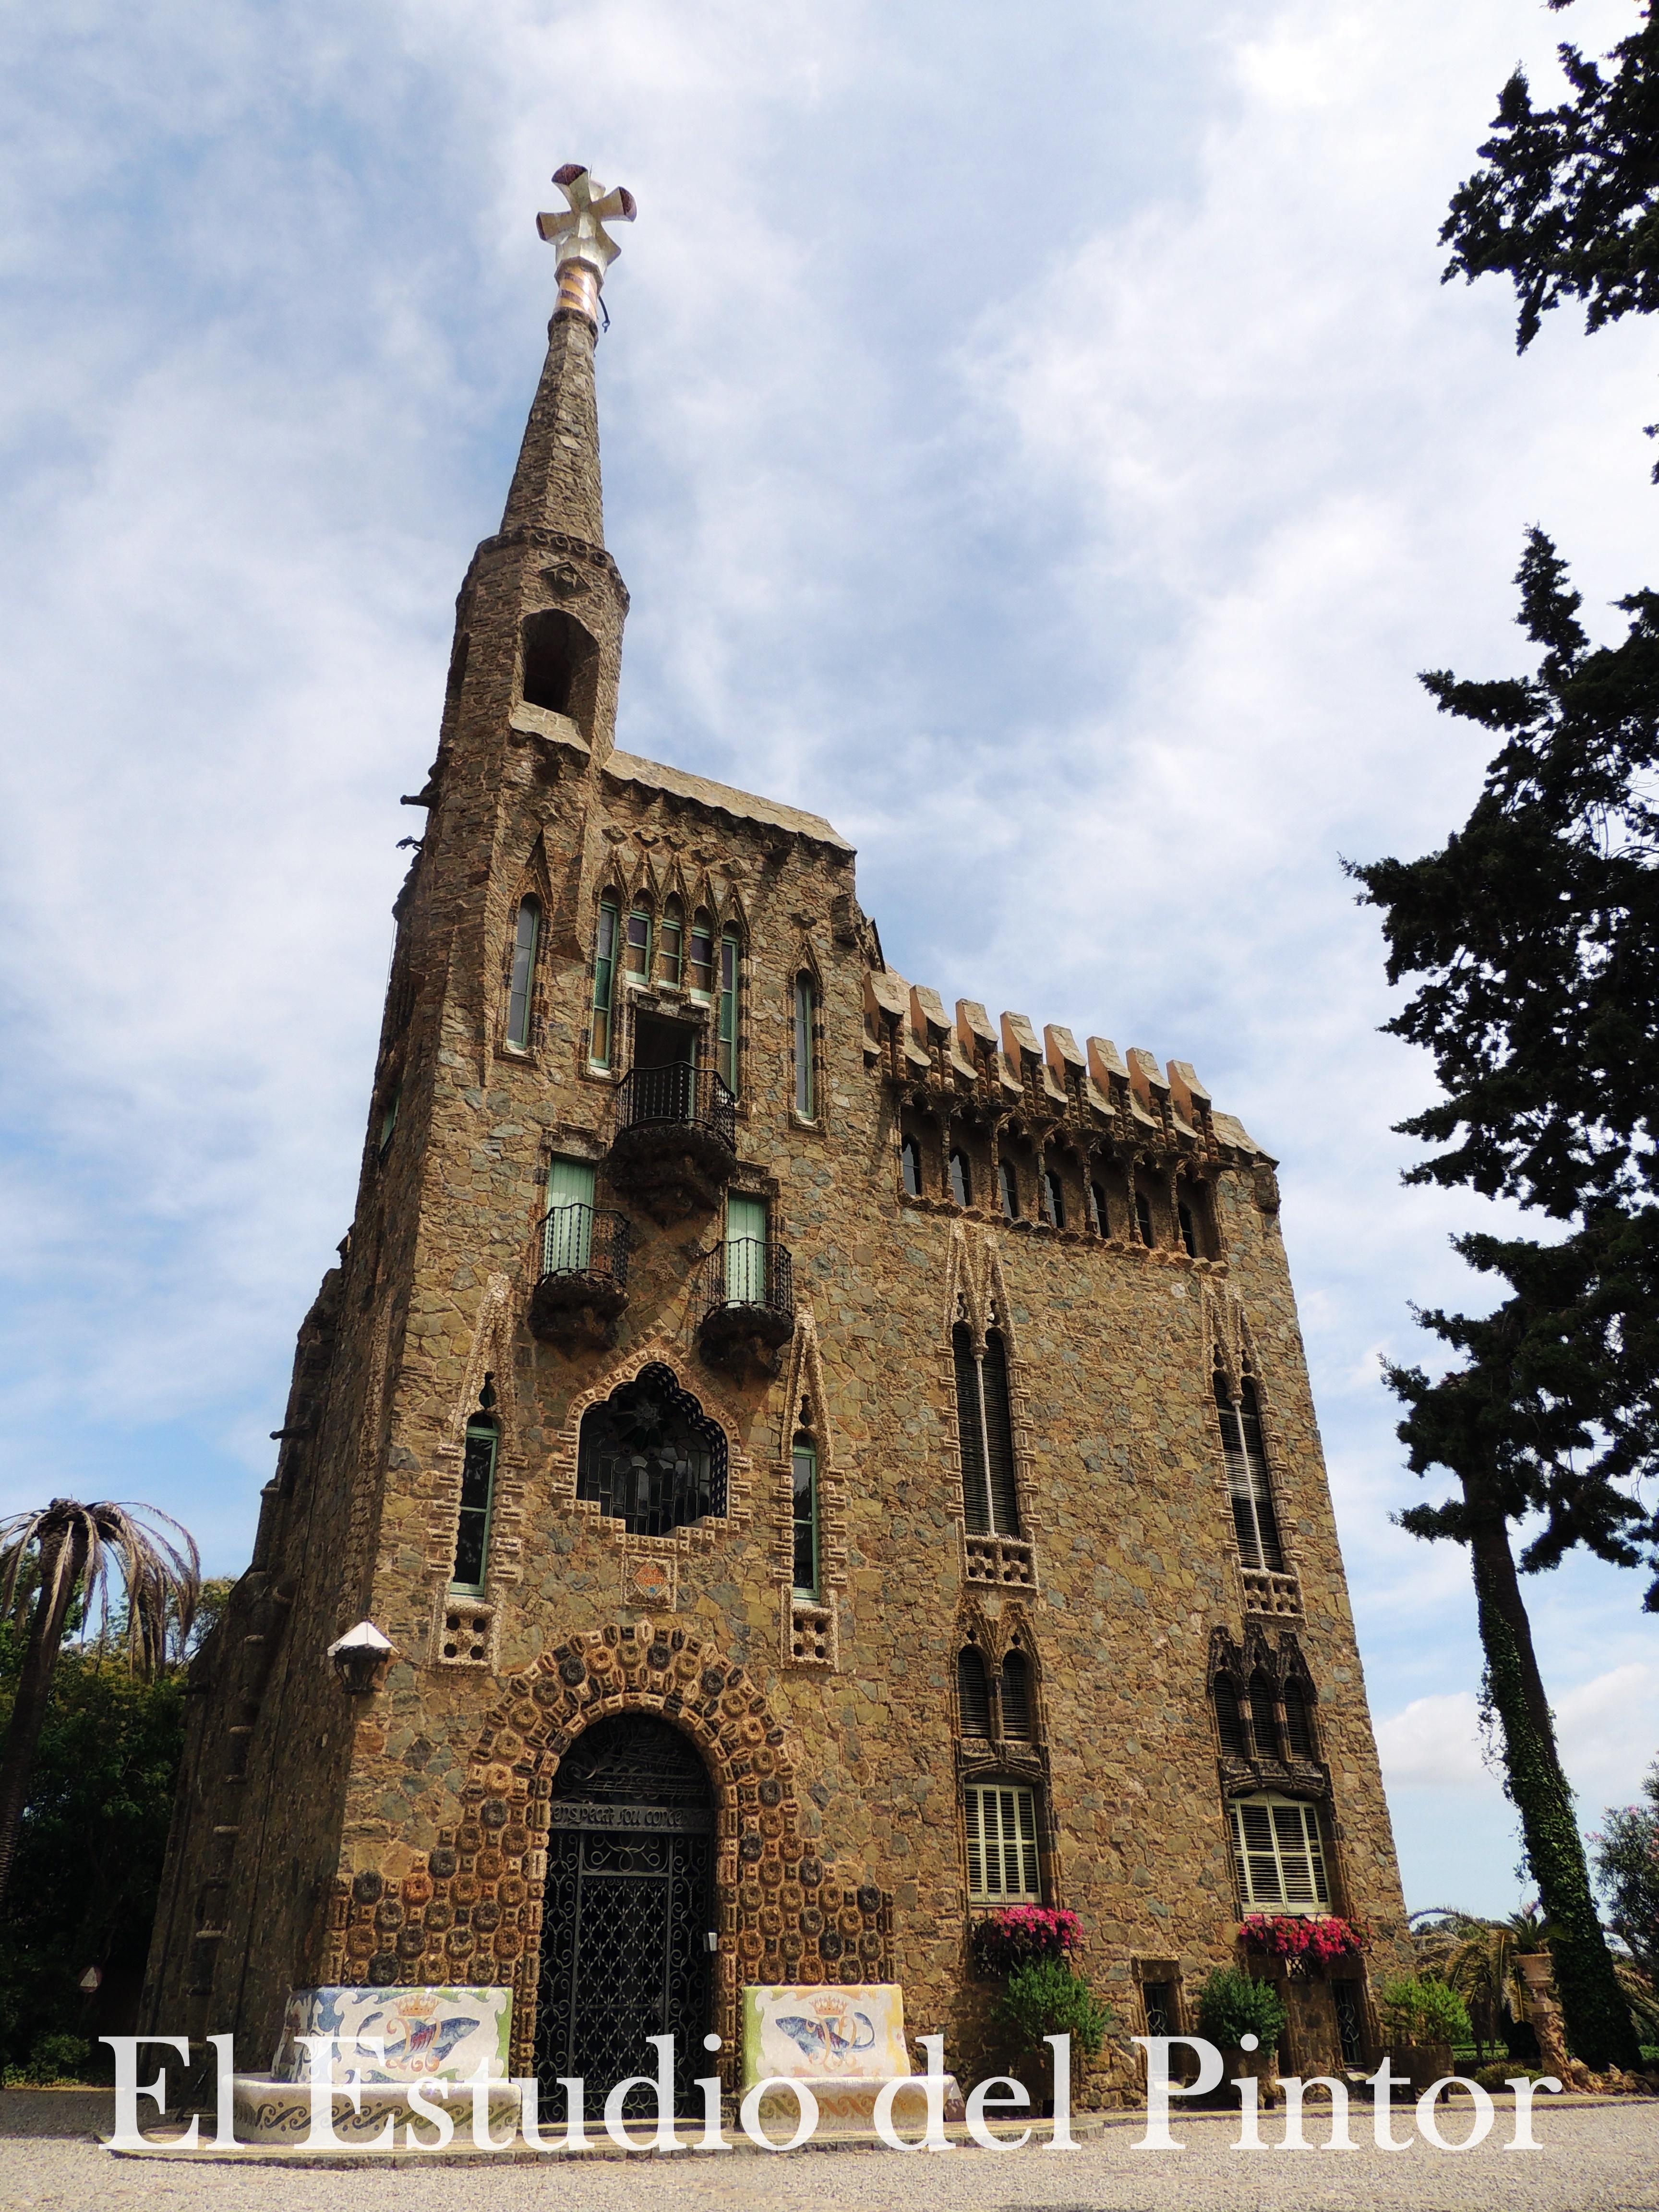 7. Torre Bellesguard, Gaudí